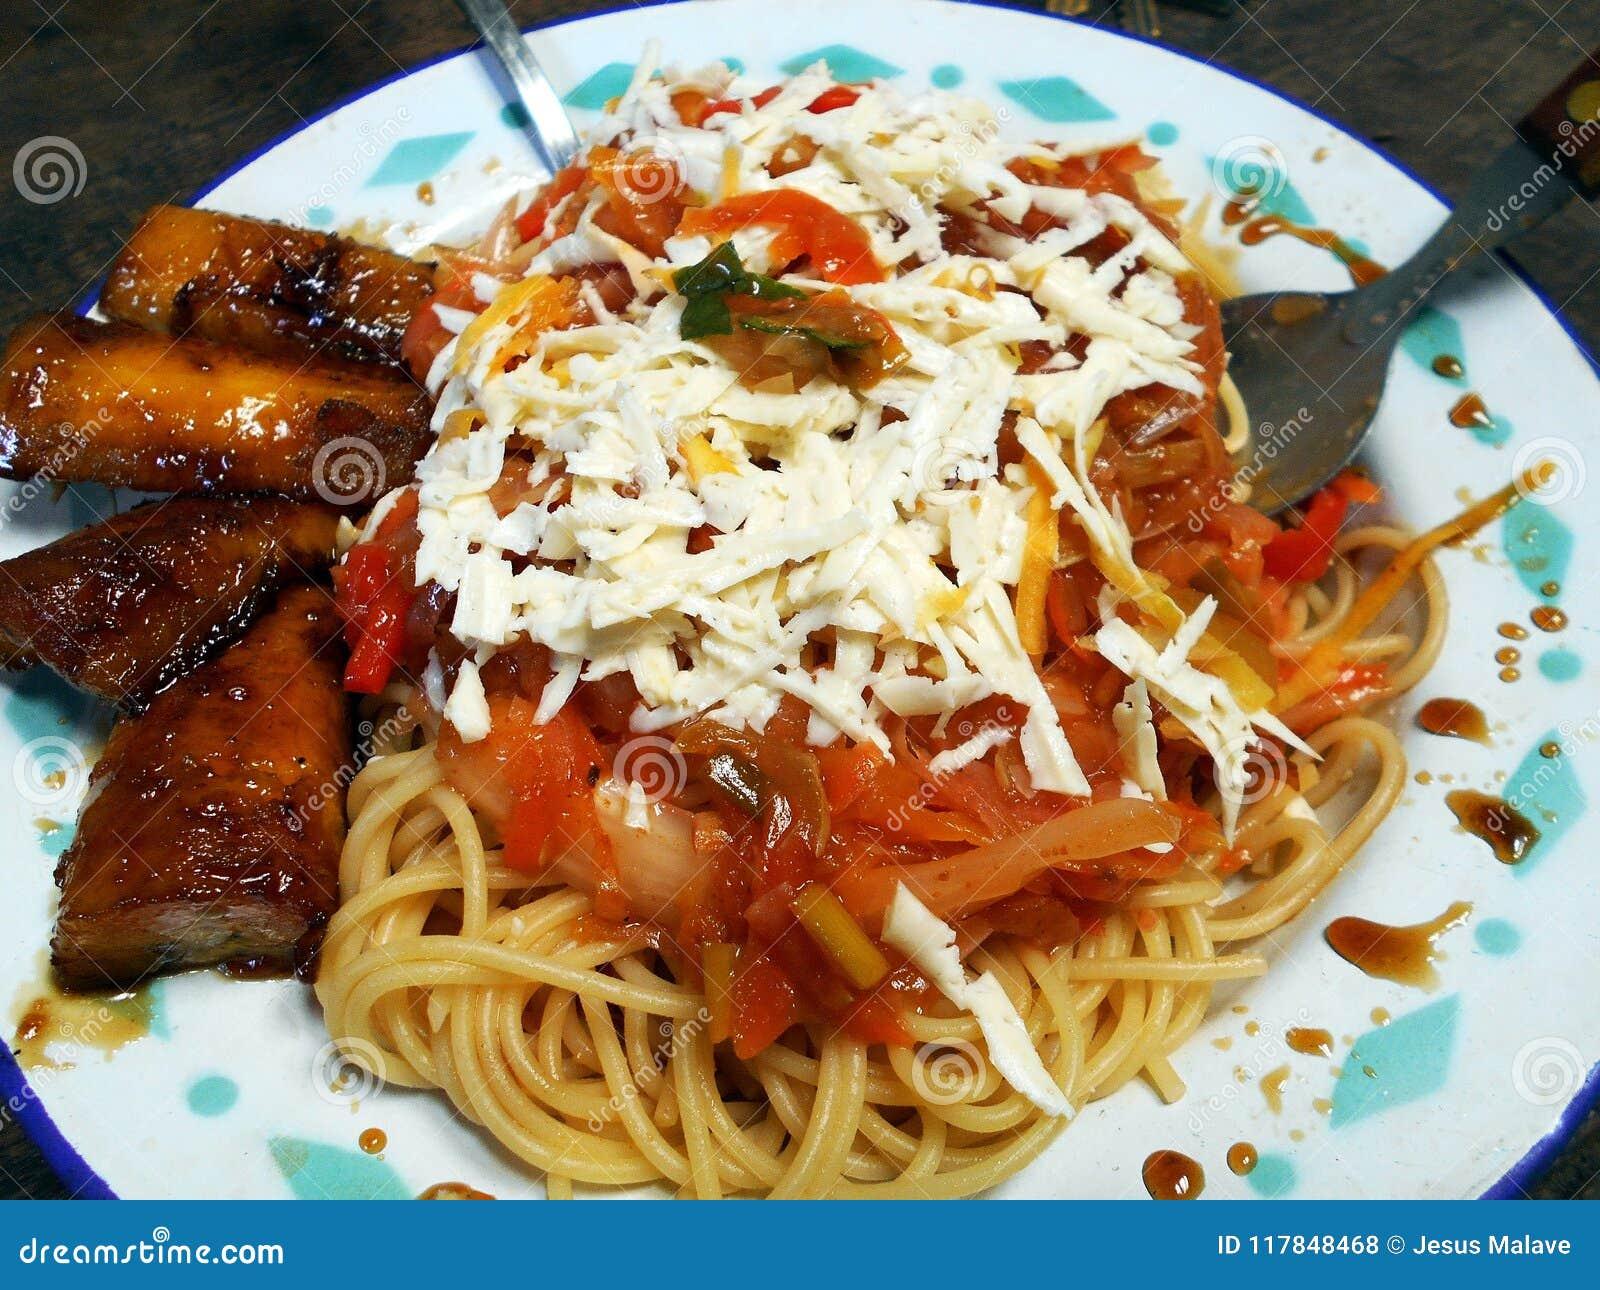 Spaghetti met kaas in de Zuidamerikaanse stijl wordt voorbereid die